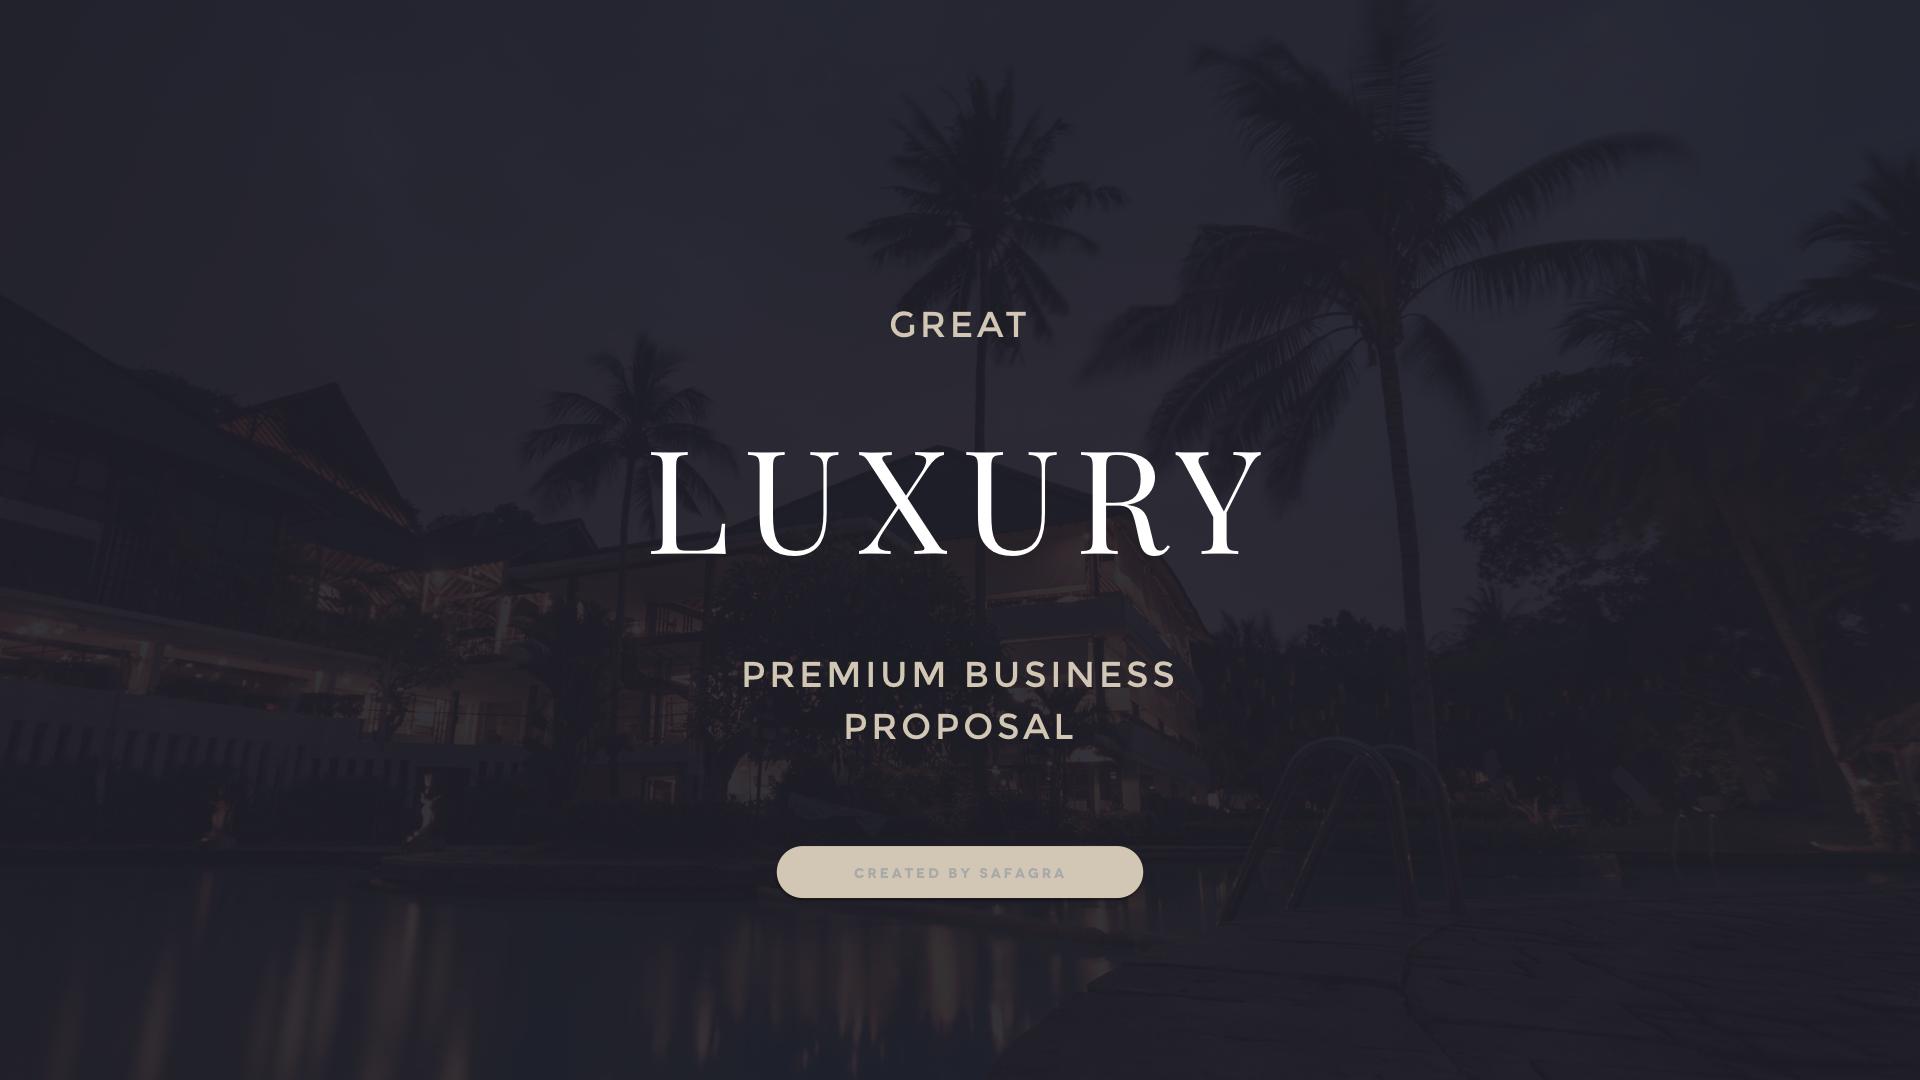 Great luxury premium business proposal powerpoint template by safagra business powerpoint templates luxury001g toneelgroepblik Images